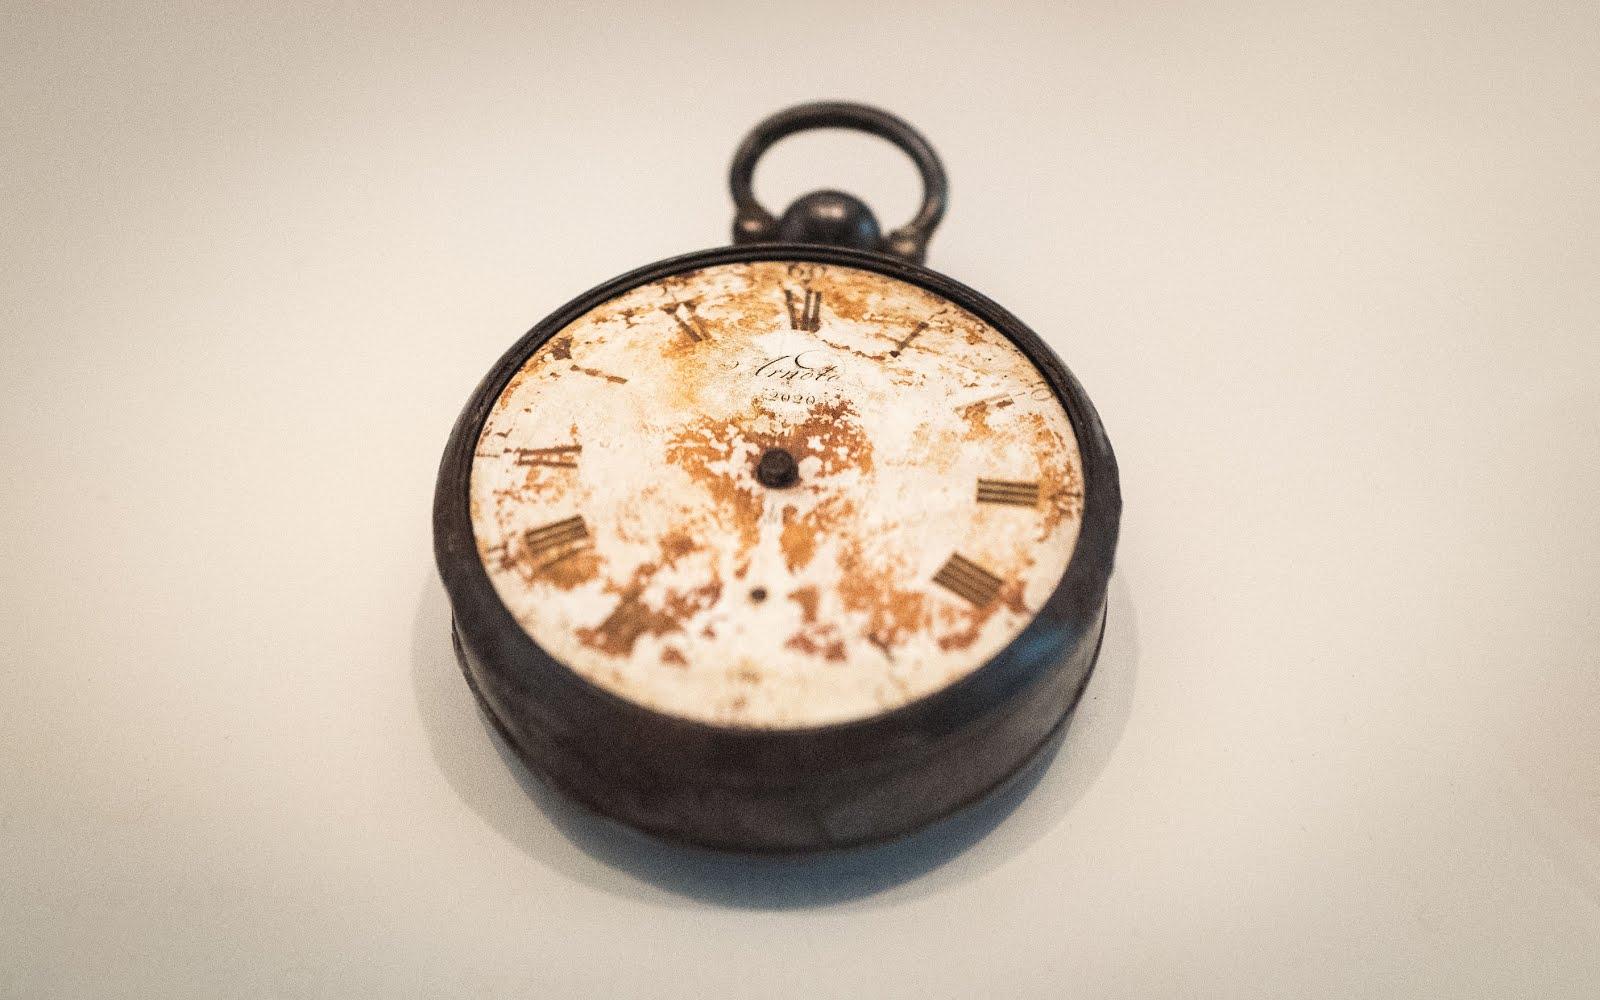 Arnold 2020 Chronometer